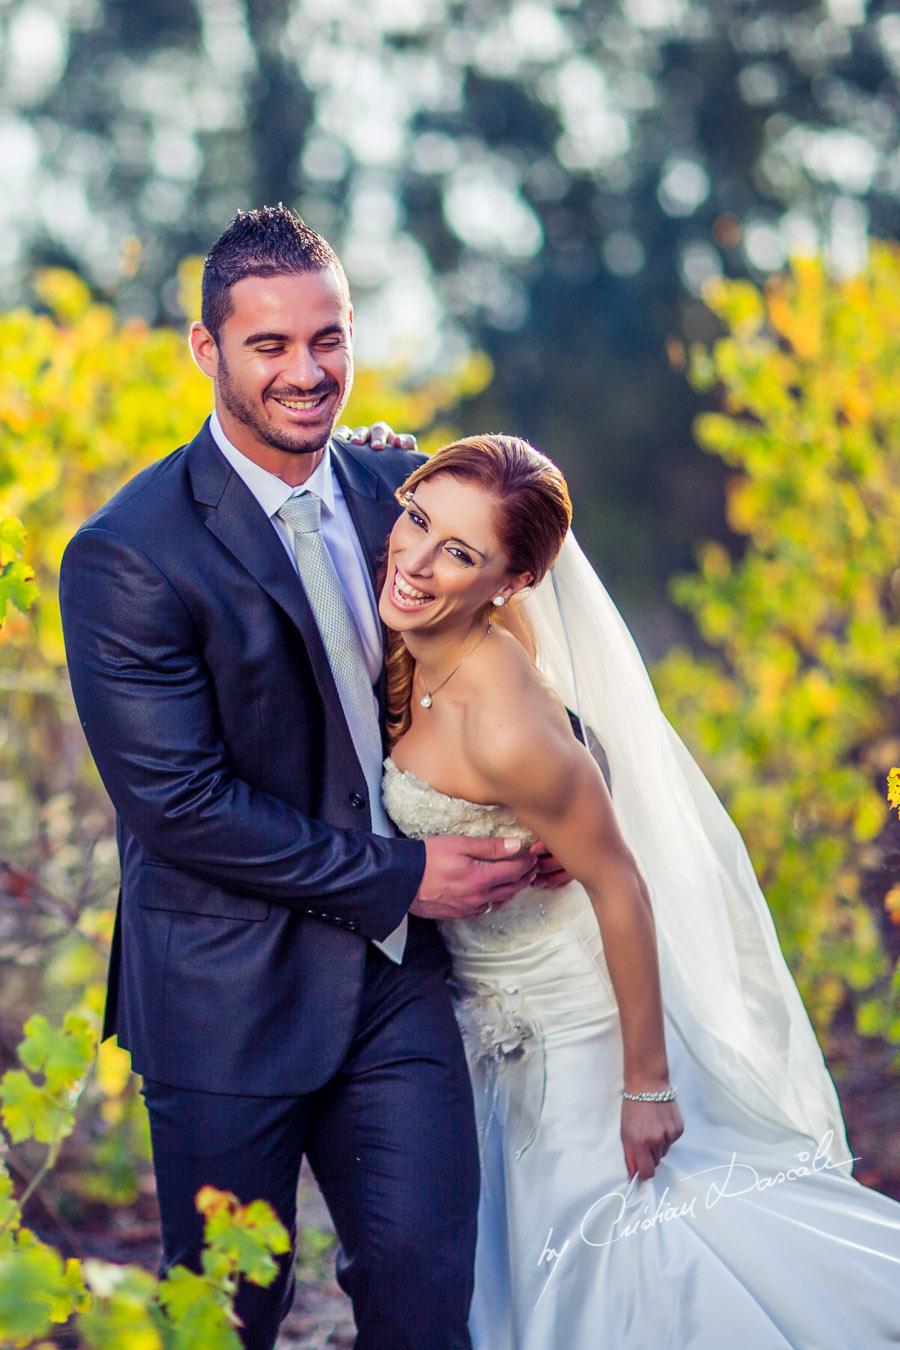 An Enchanted Wedding Photo Session - Marina & Xristos. Cyprus Photographer: Cristian Dascalu